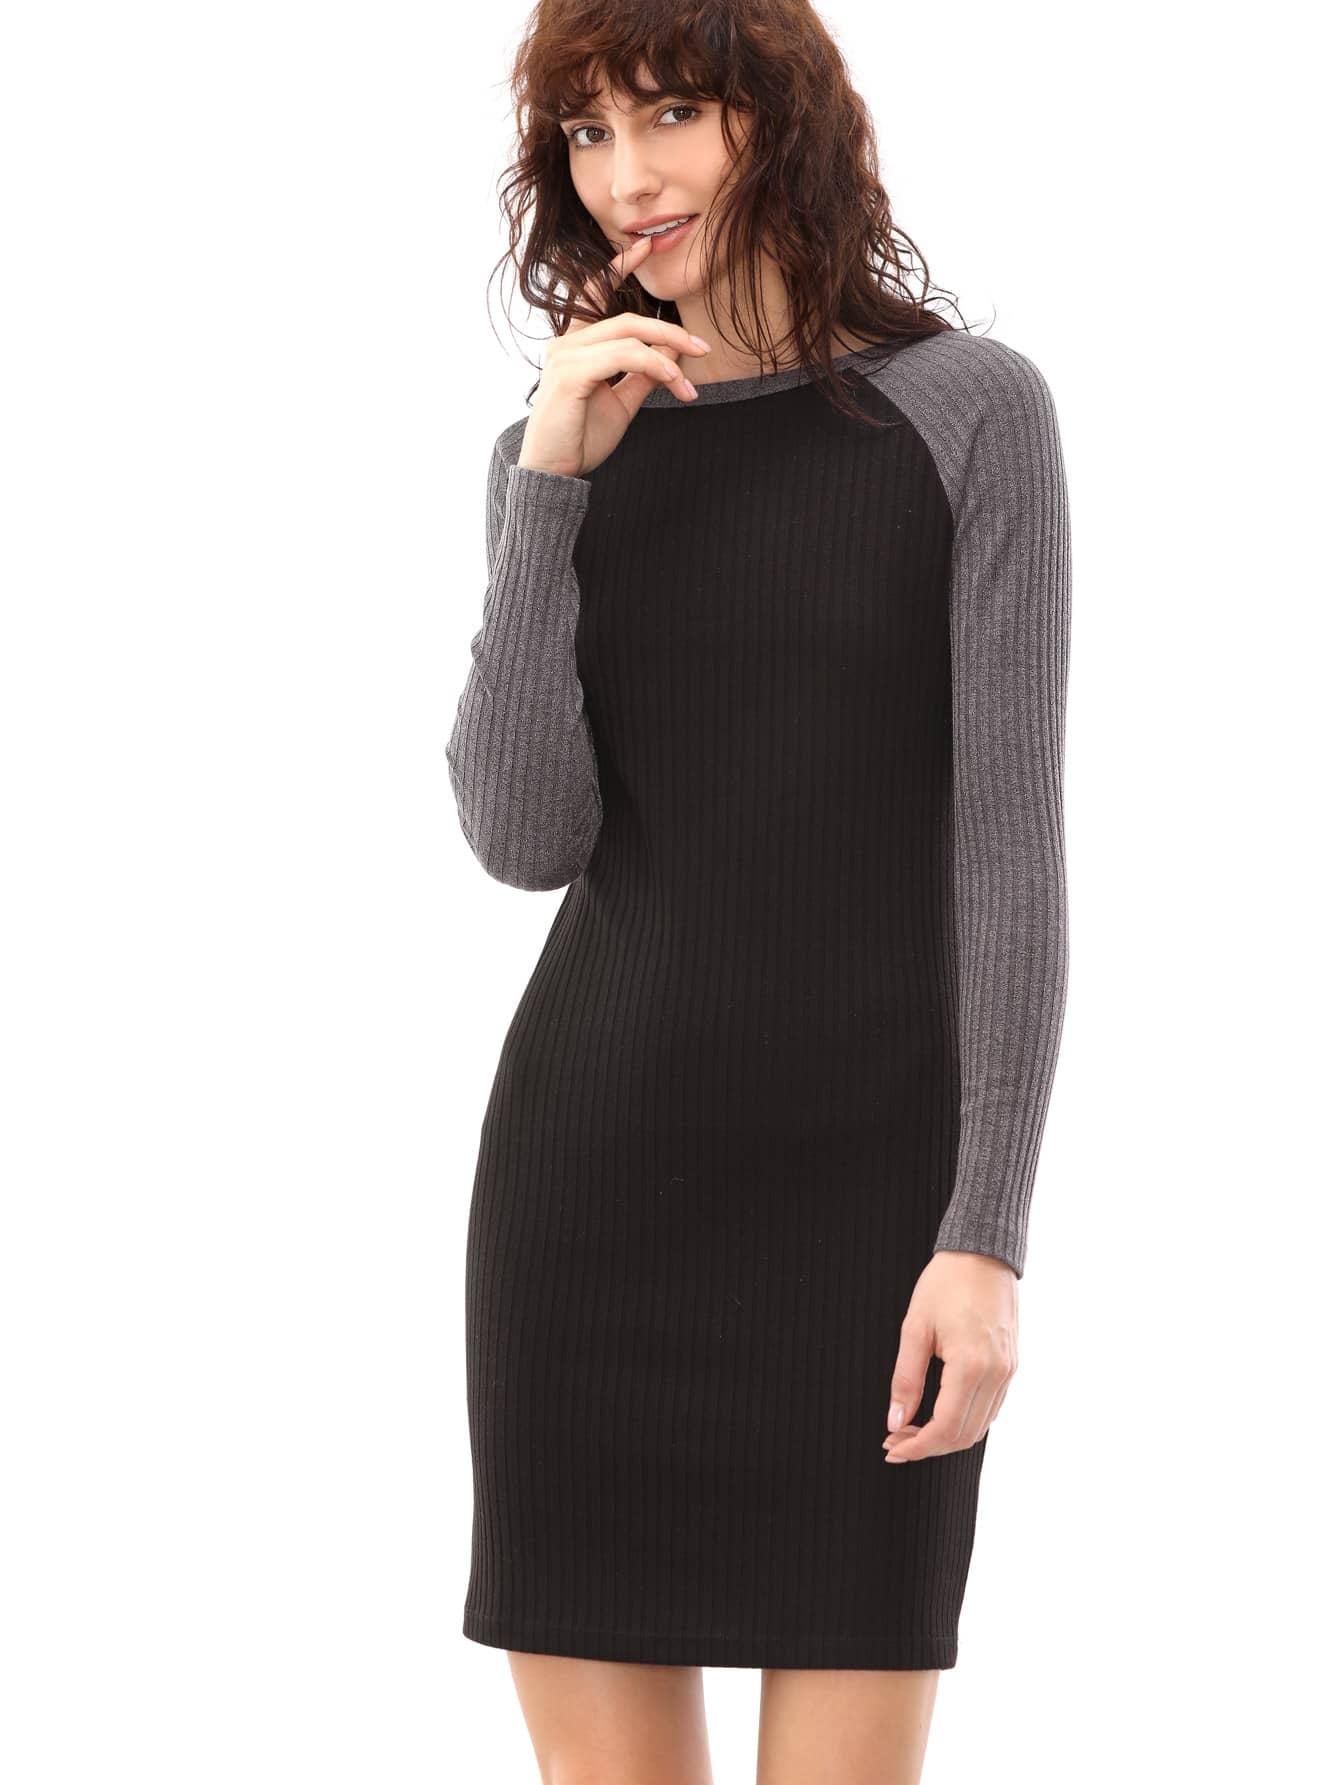 Black Ribbed Knit Contrast Raglan Sleeve Sheath Dress dress161130715